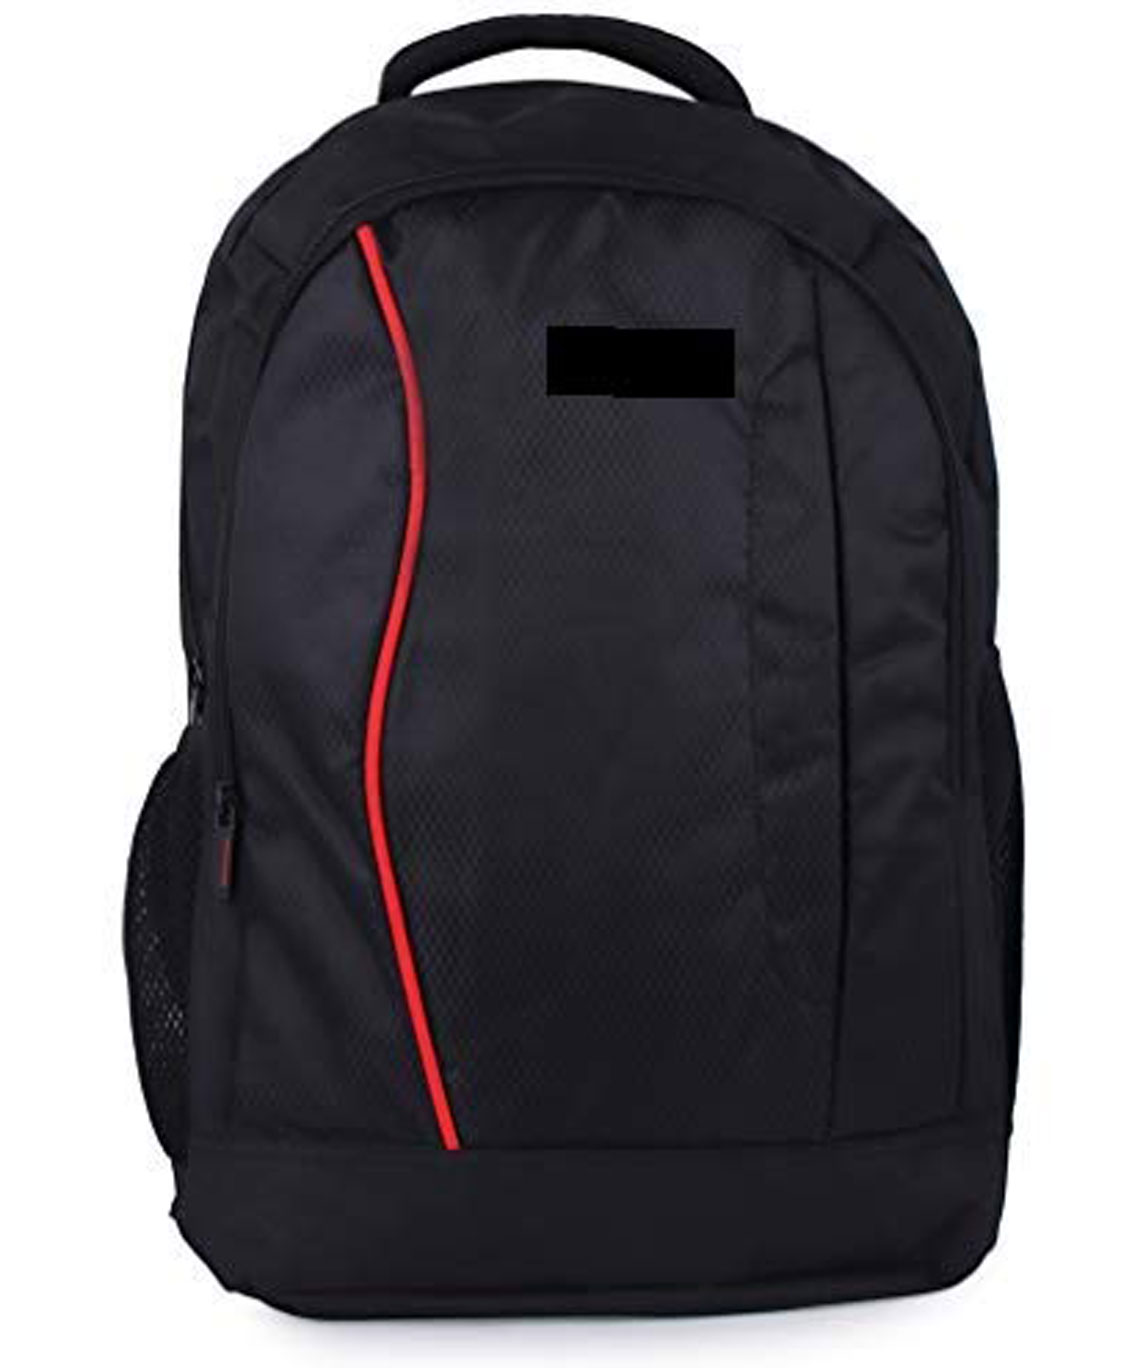 Faisal Raza 30 Liters Casual Bagpack/School Bag/Laptop Backpack(Black::Red)